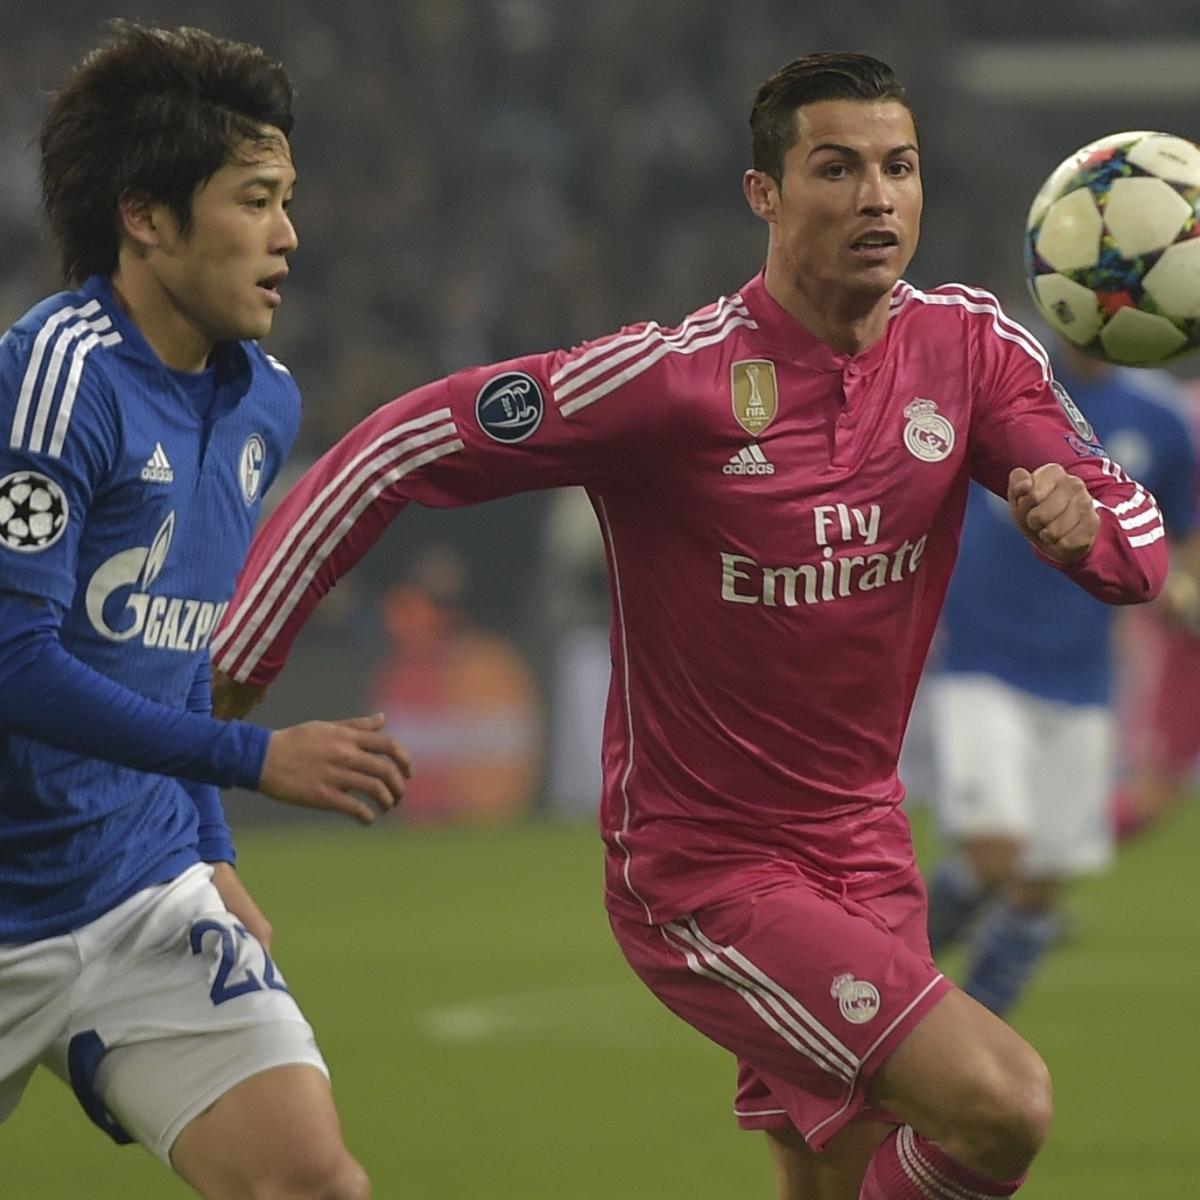 Champions League 2019 Round Of 16 Leg 2 Live Stream Tv: Real Madrid Vs. Schalke: Team News, Predicted Line-Ups